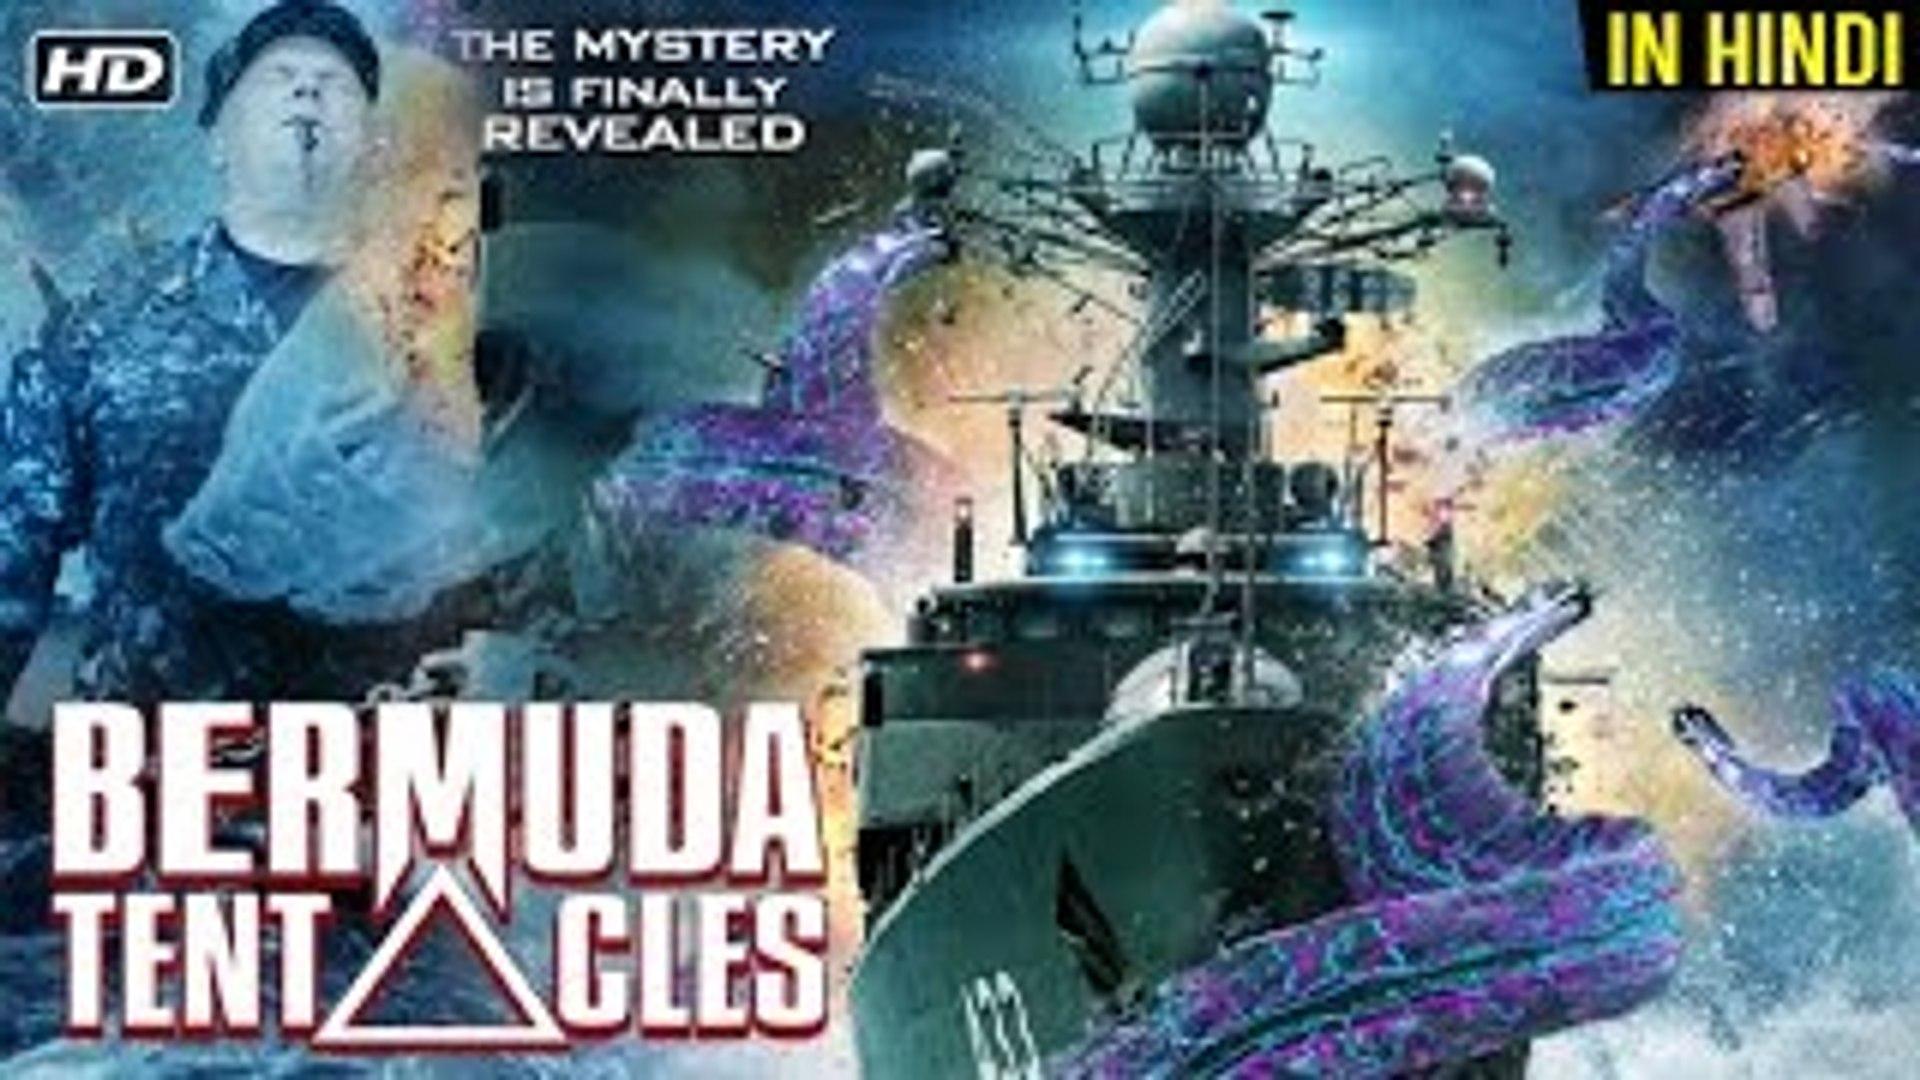 Free Download Bermuda Triangle Movie Hindi Dubbed On Torrent | Dabbe 5  Zehri Cin Full Izle Hd T